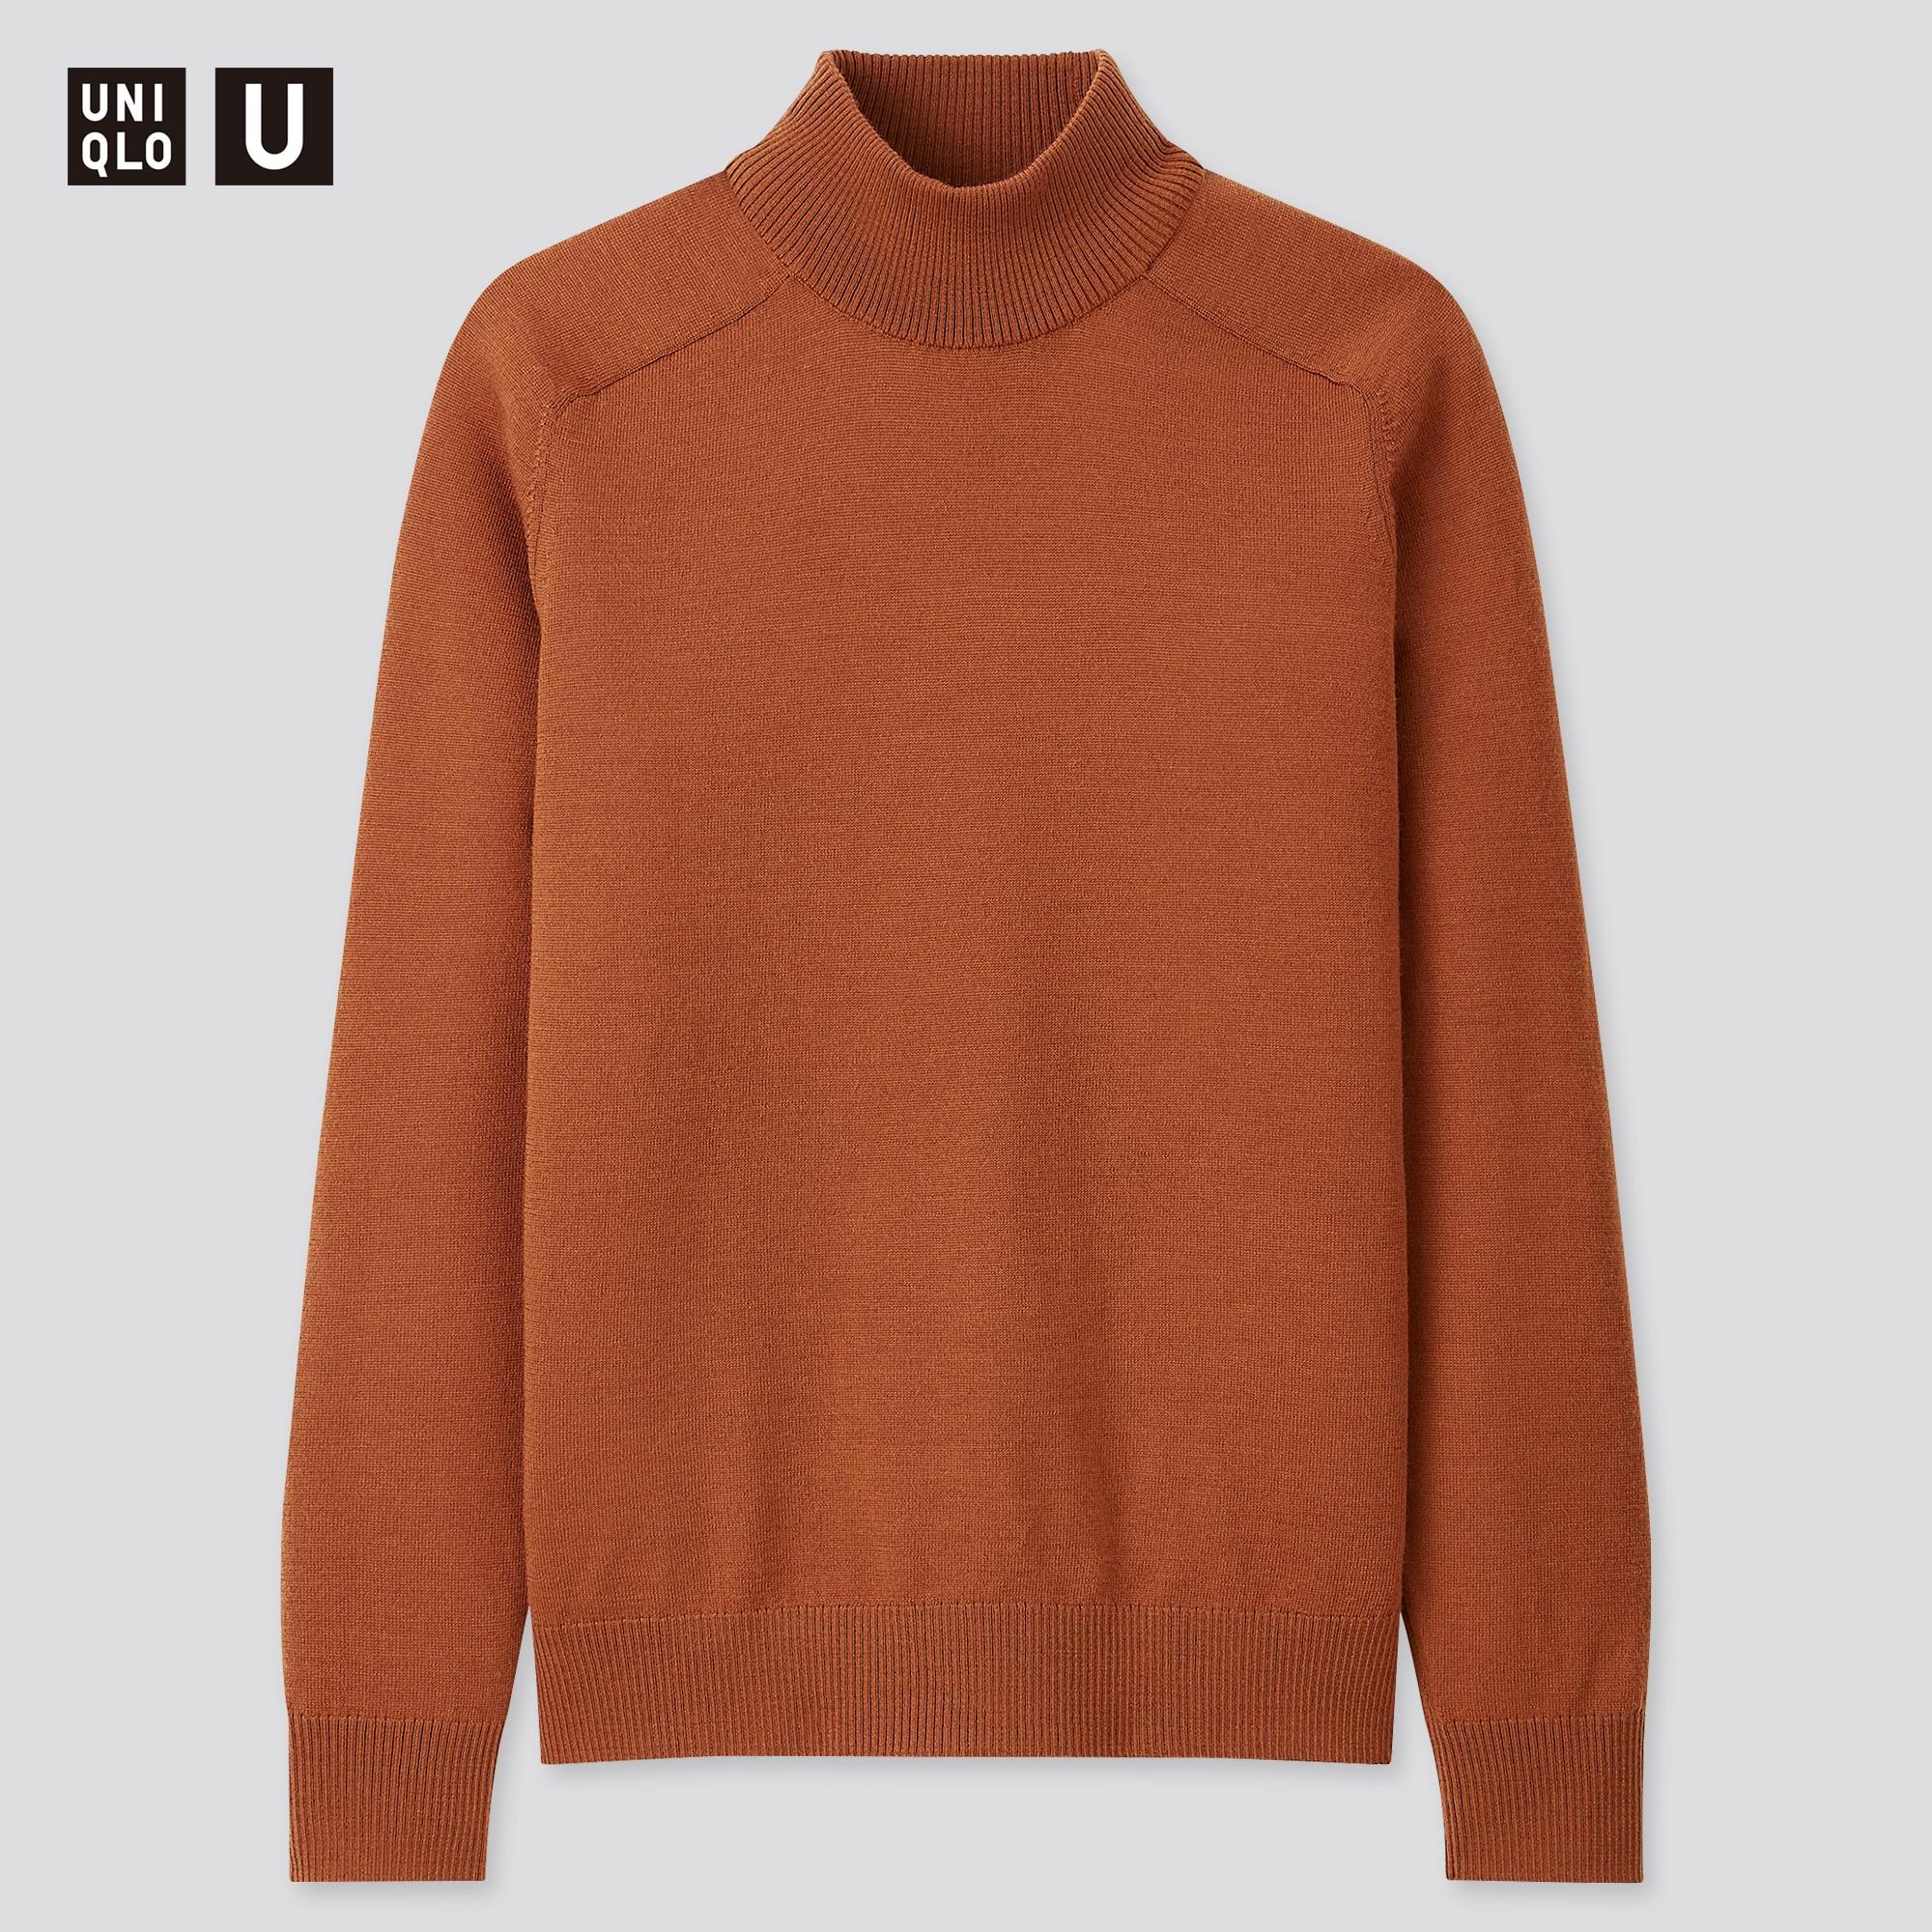 men u merino-blend mock-neck long-sleeve sweater